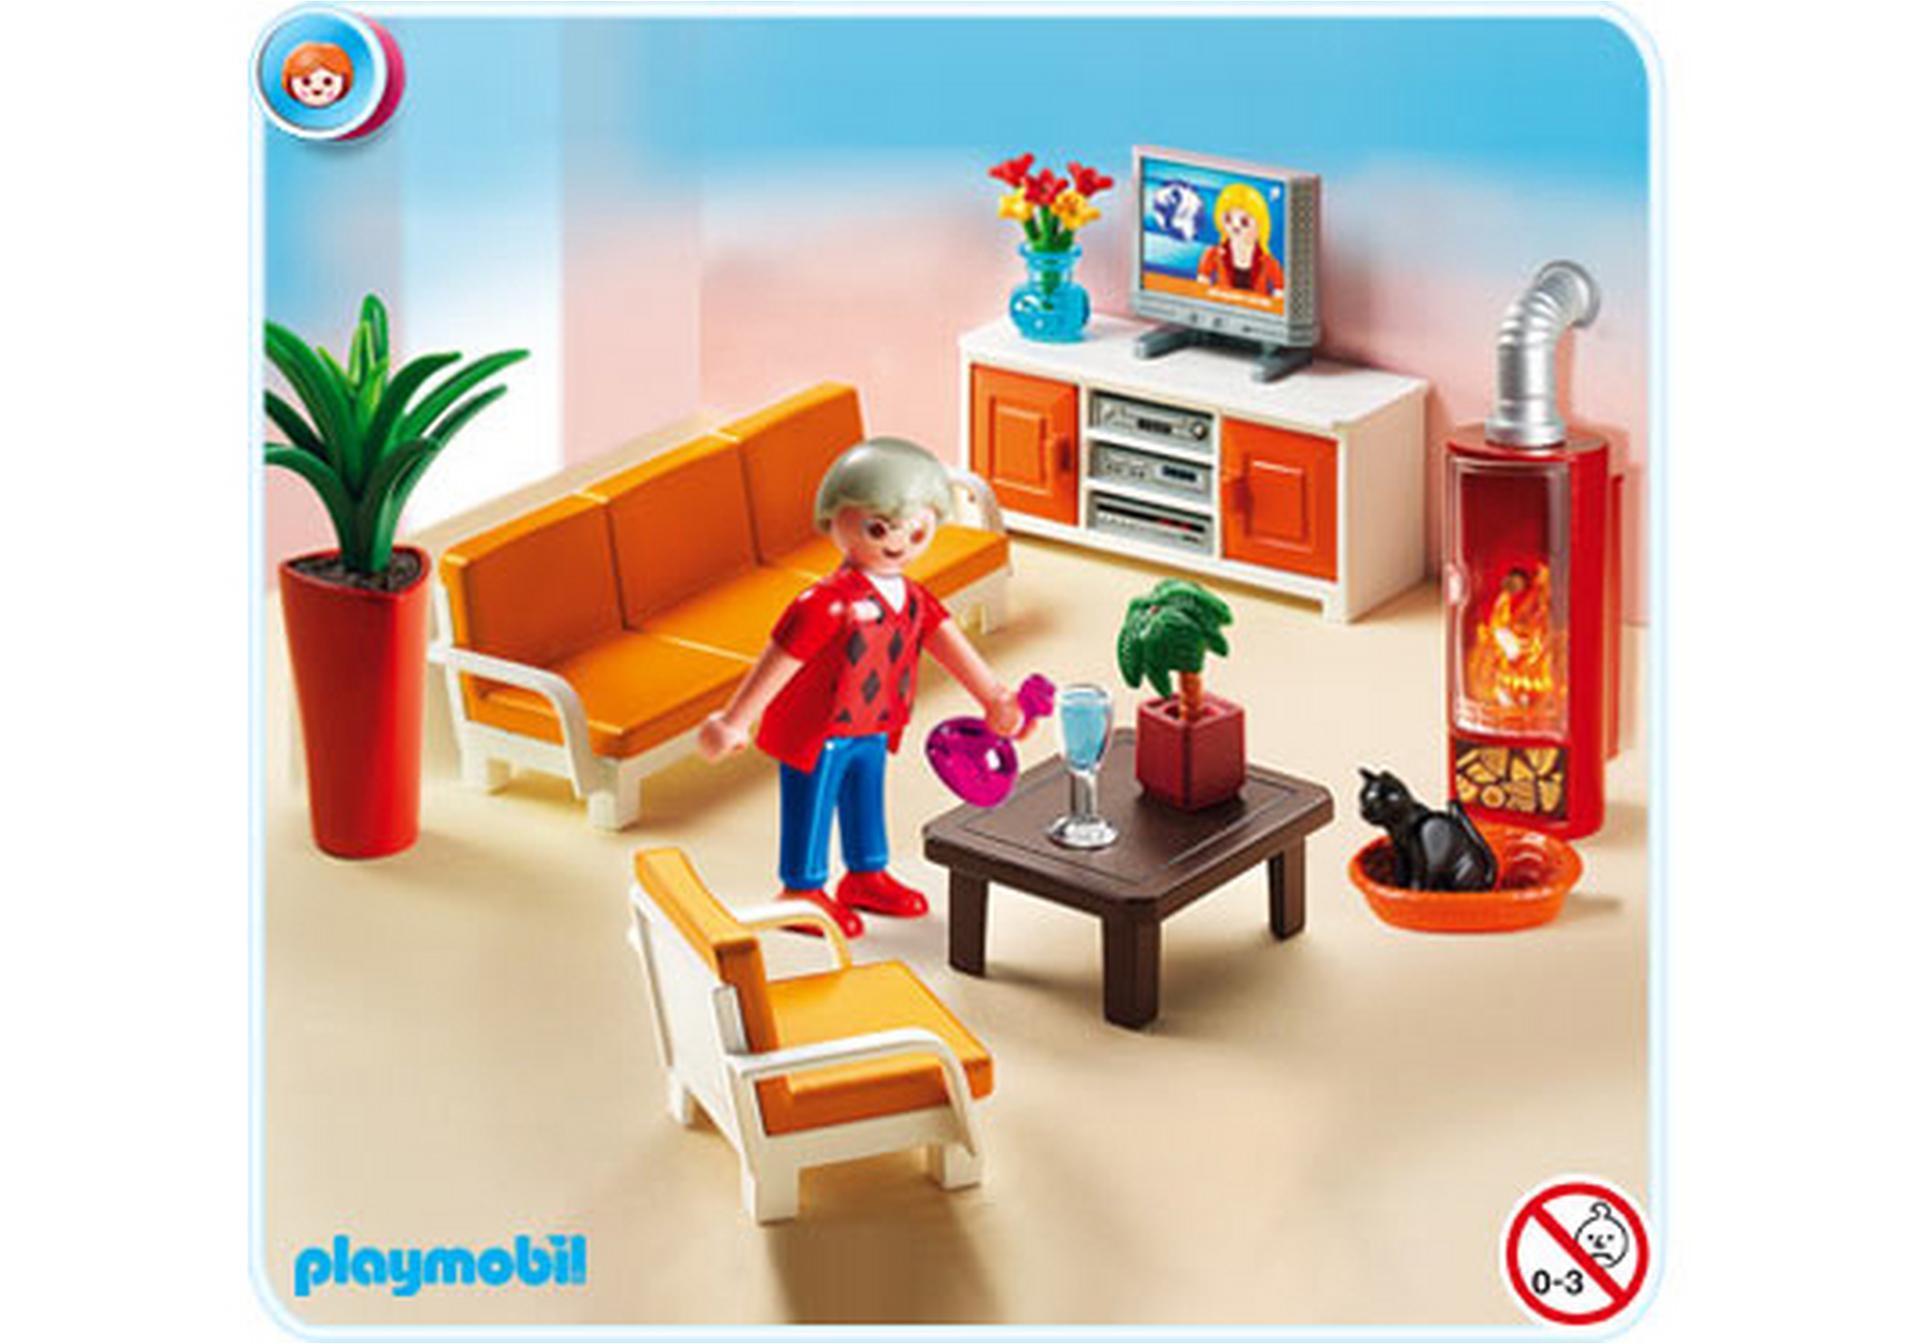 Salon avec chemin e 5332 a playmobil france - Playmobil wohnzimmer 5332 ...